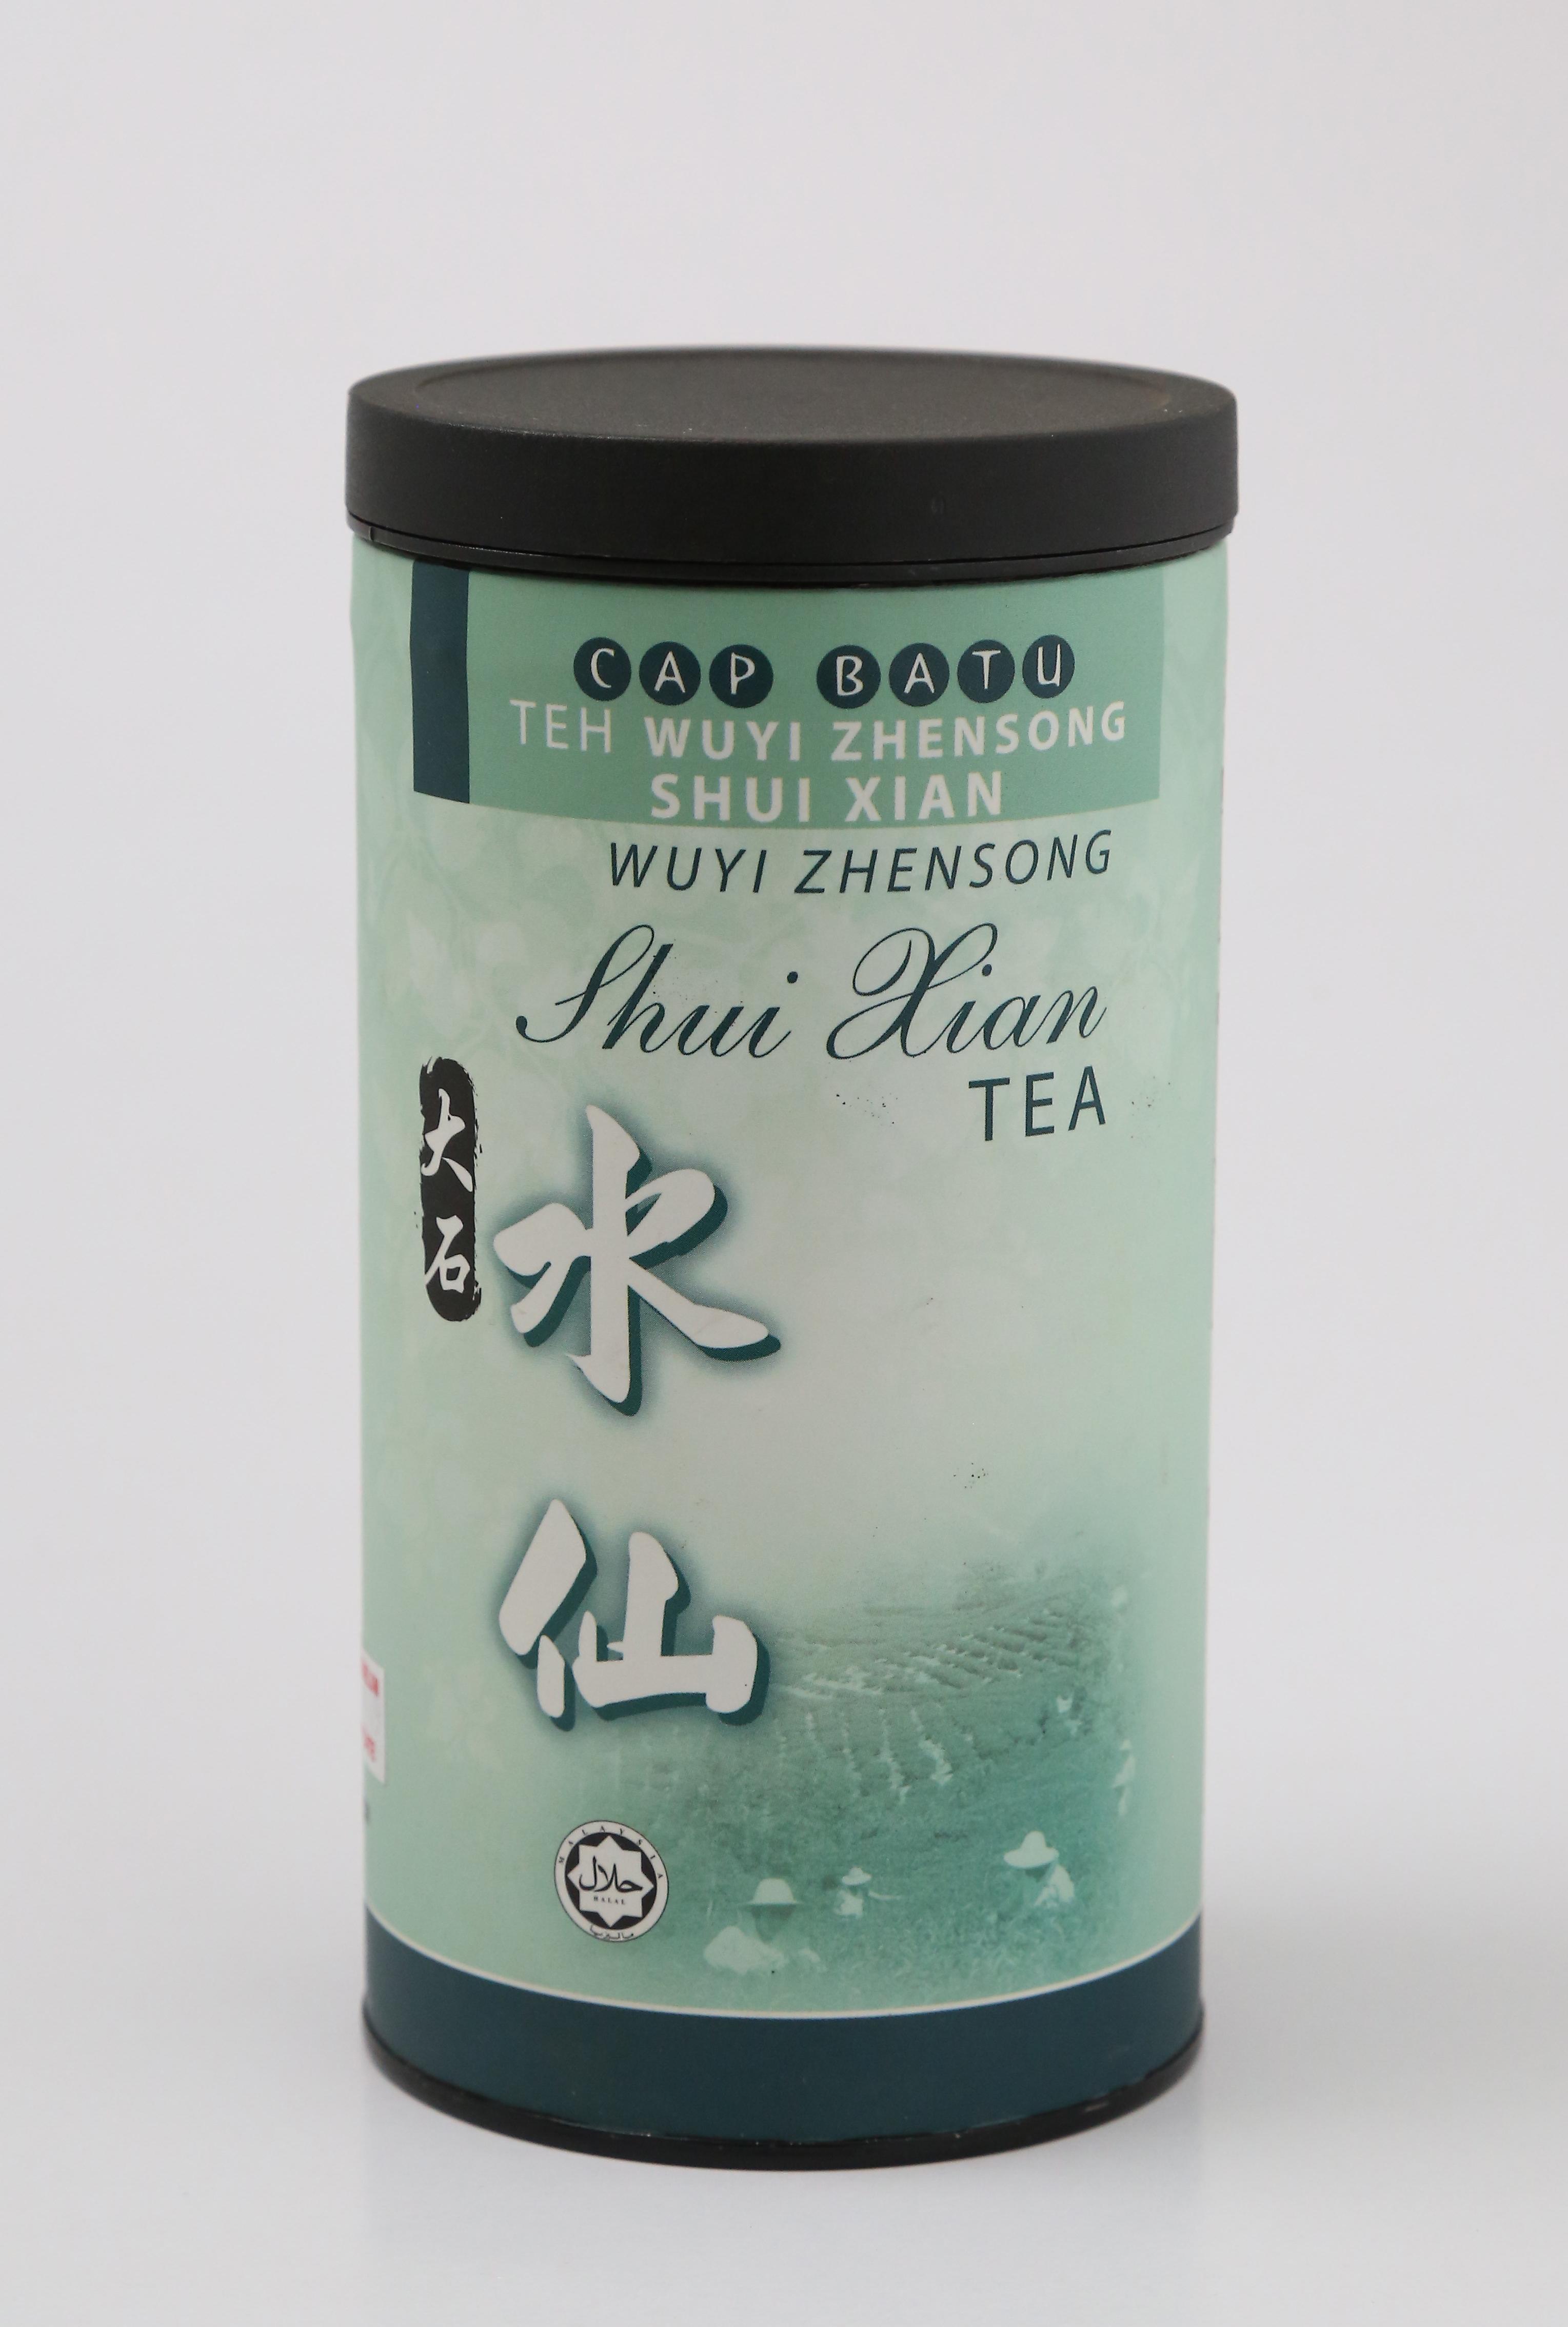 Chinese Tea image